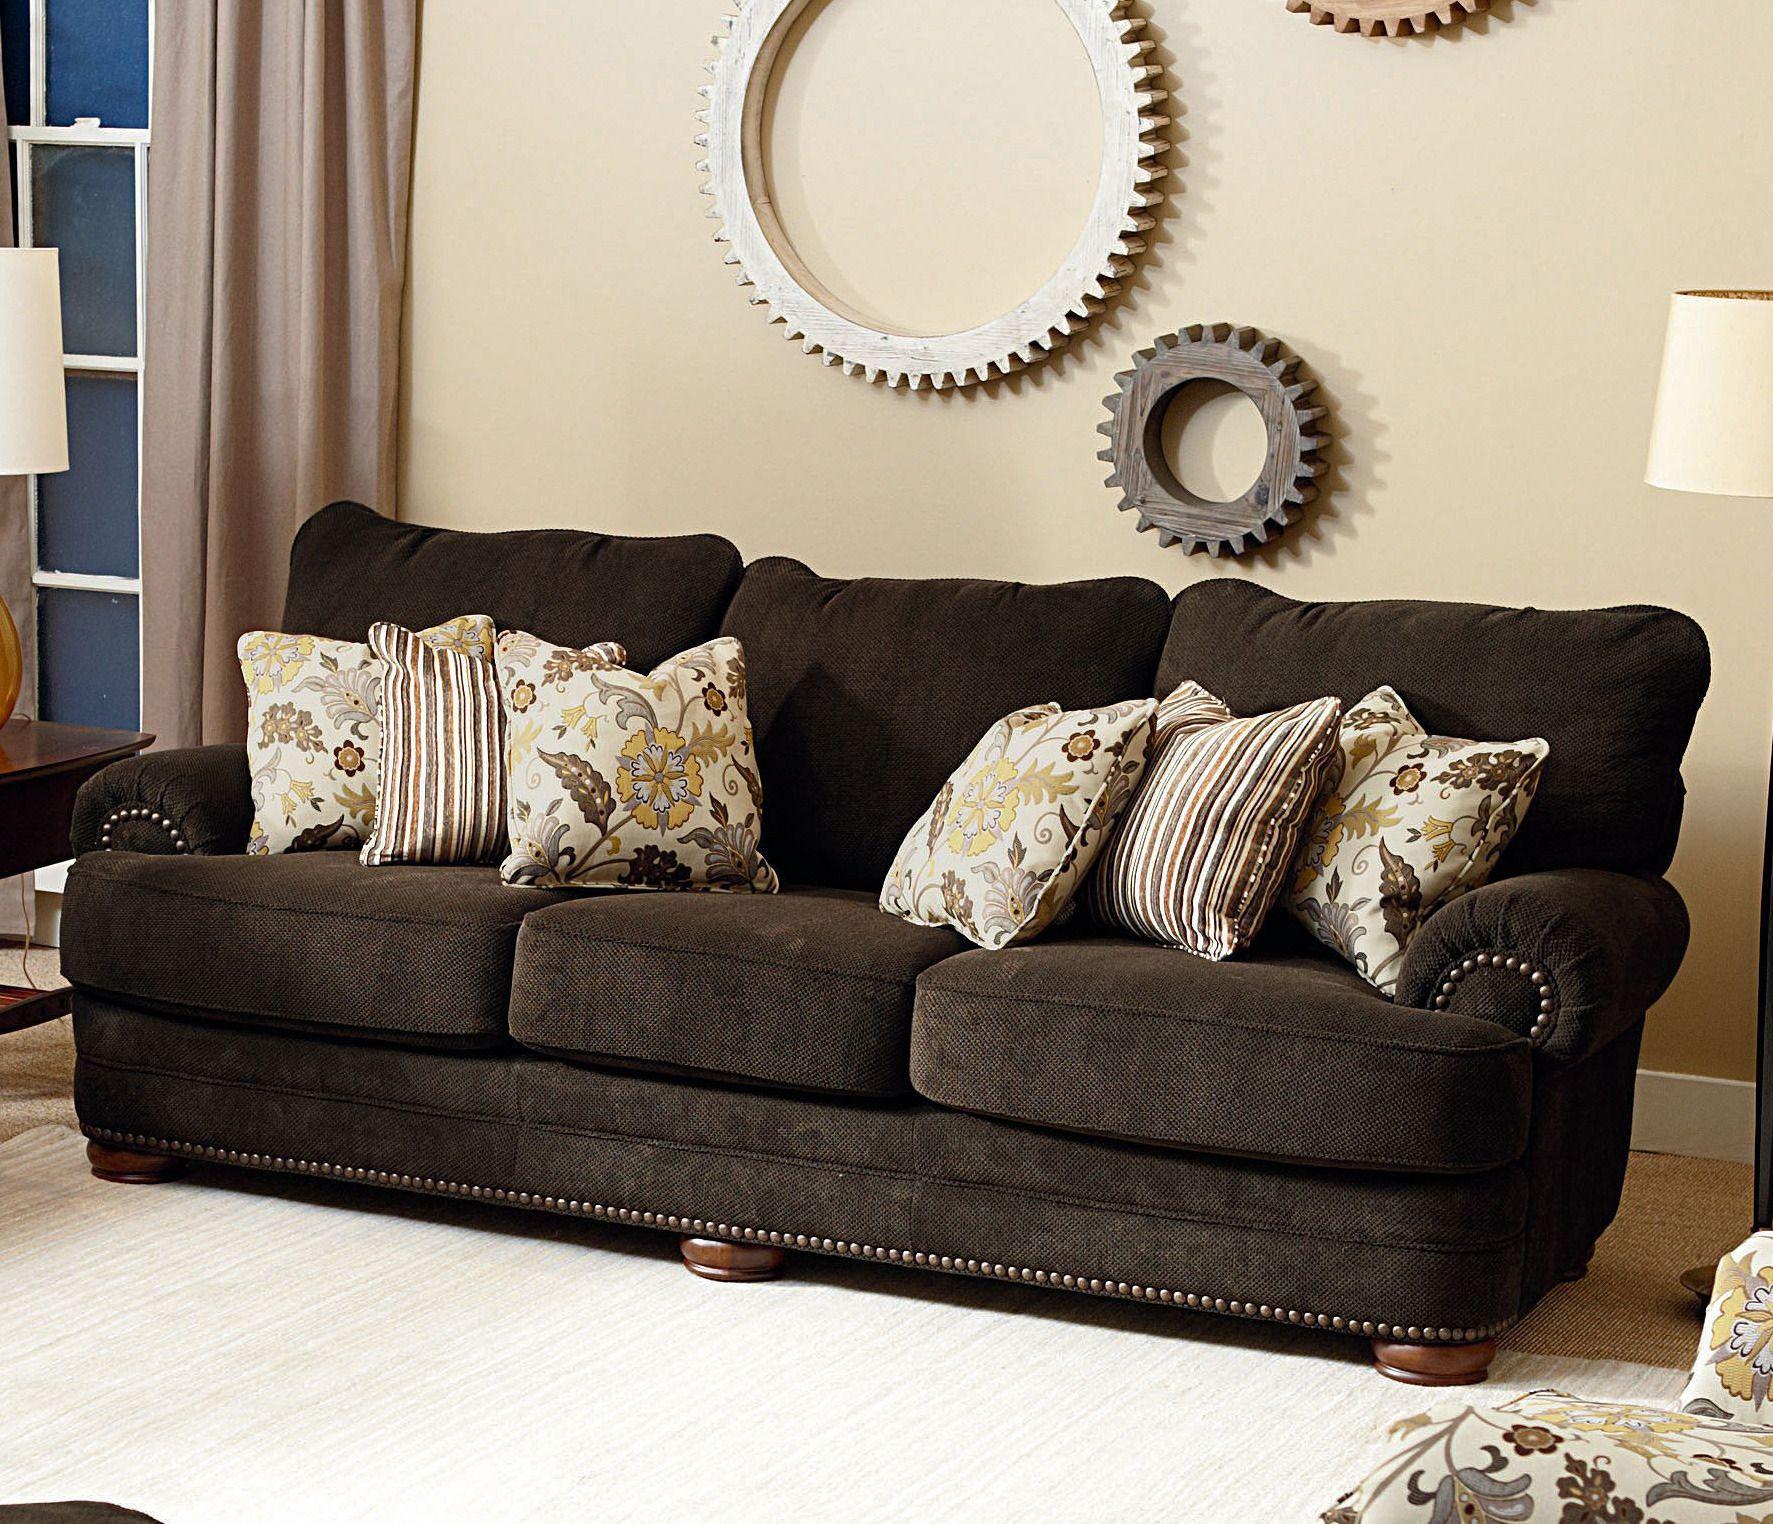 Peachy Stanton Sofa Lane Home Gallery Stores Living Room Cjindustries Chair Design For Home Cjindustriesco